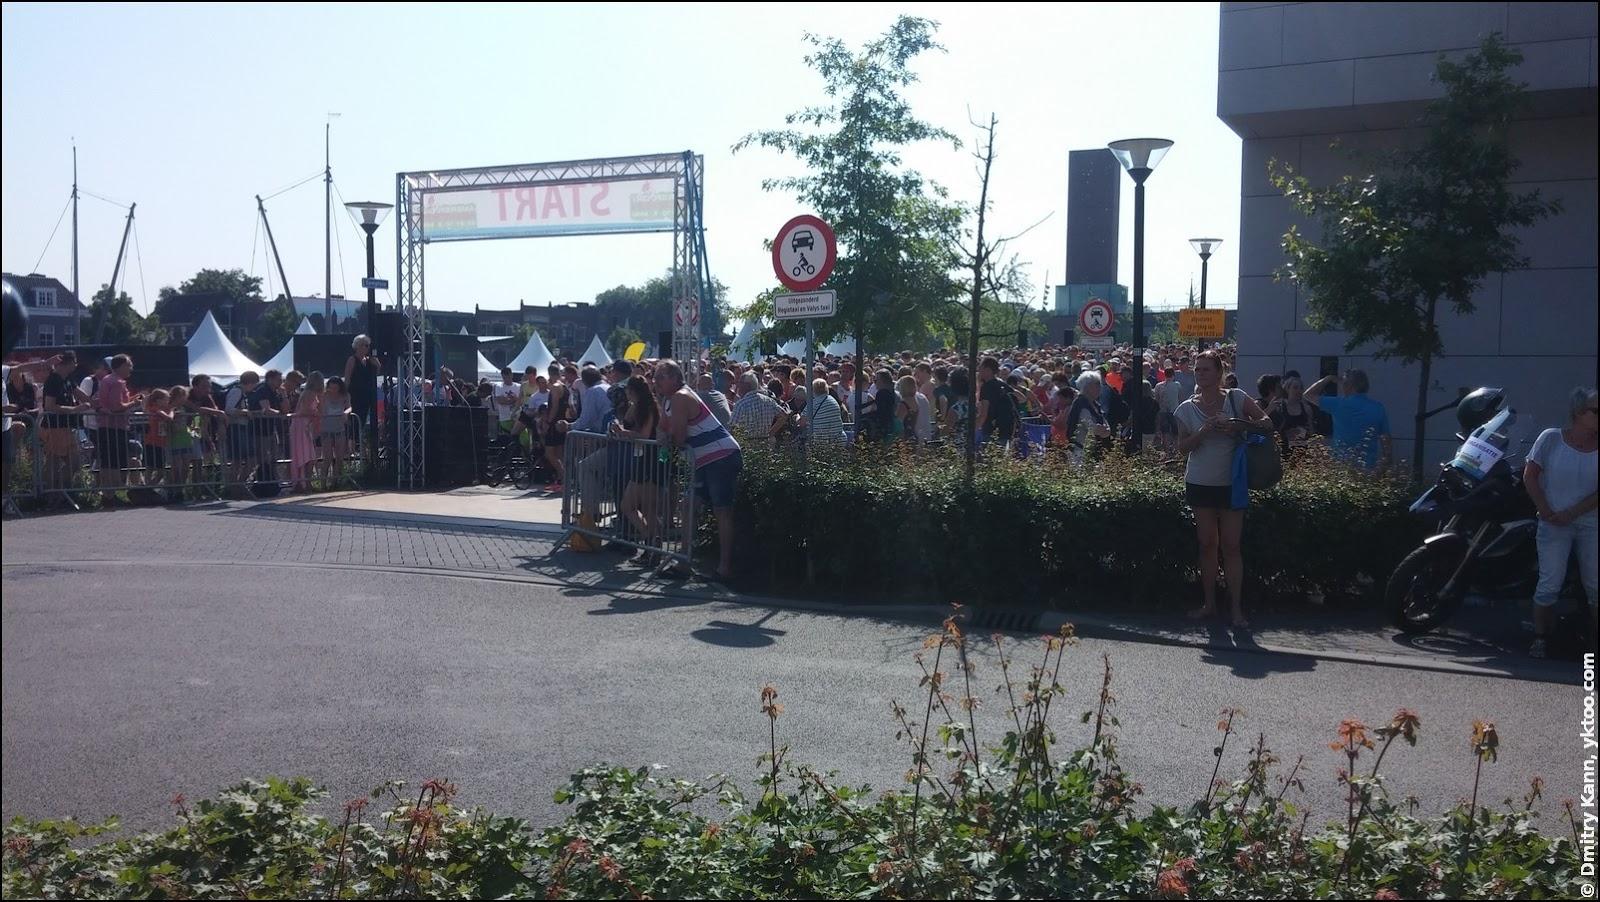 The start line.